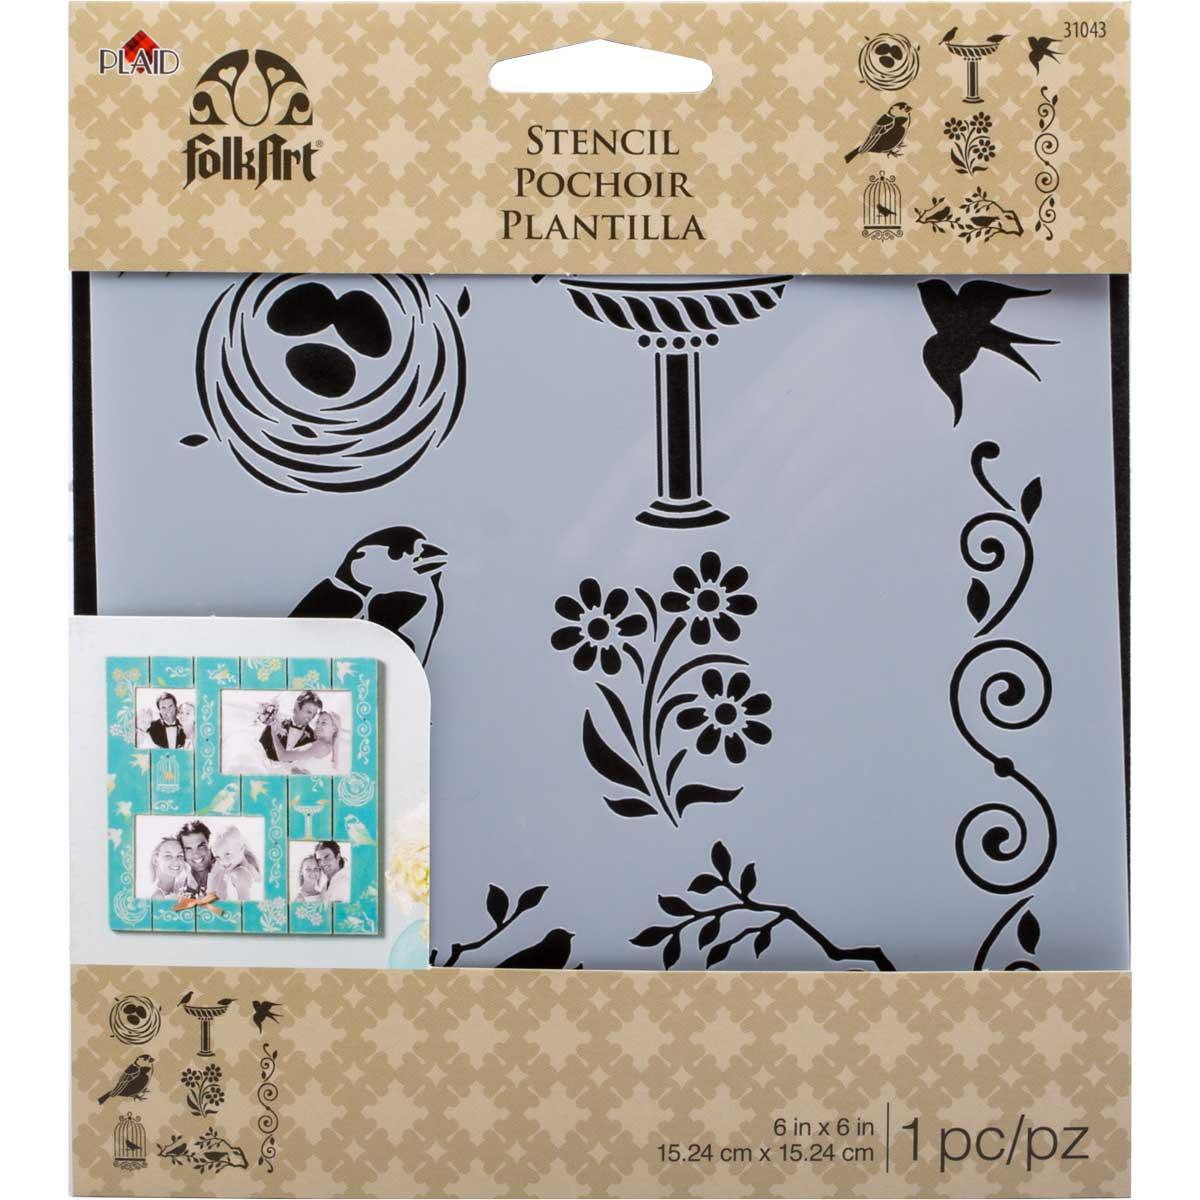 Shop Plaid Folkart Painting Stencils Small Birds 31043 31043 Plaid Online